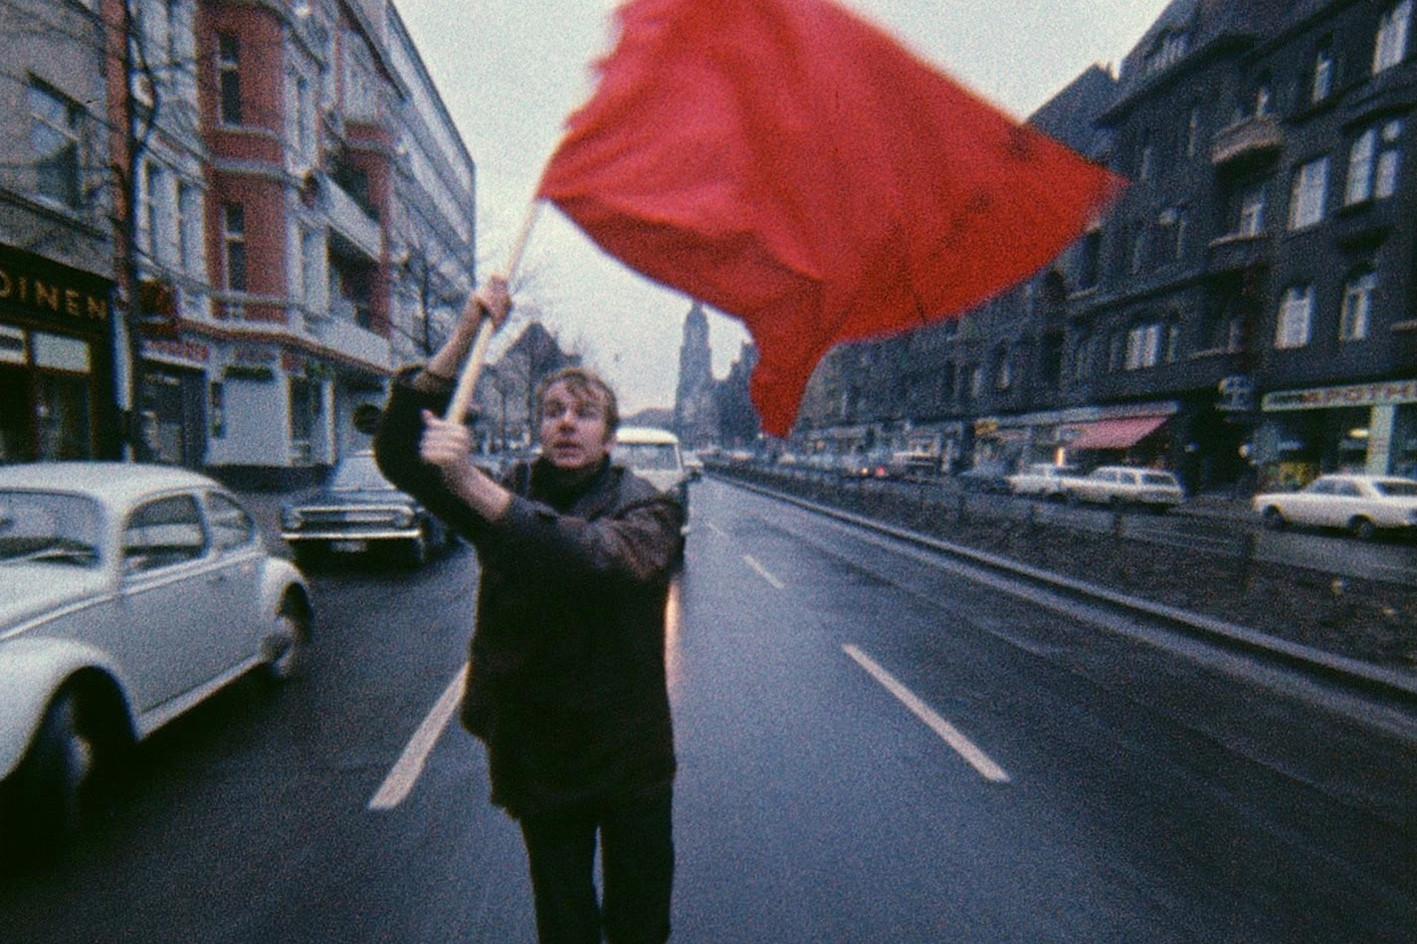 Gerd Conradt (*1941), Farbtest - Rote Fahne, 1968, Farbfilm, 16 mm, 12 Min. / Videostill